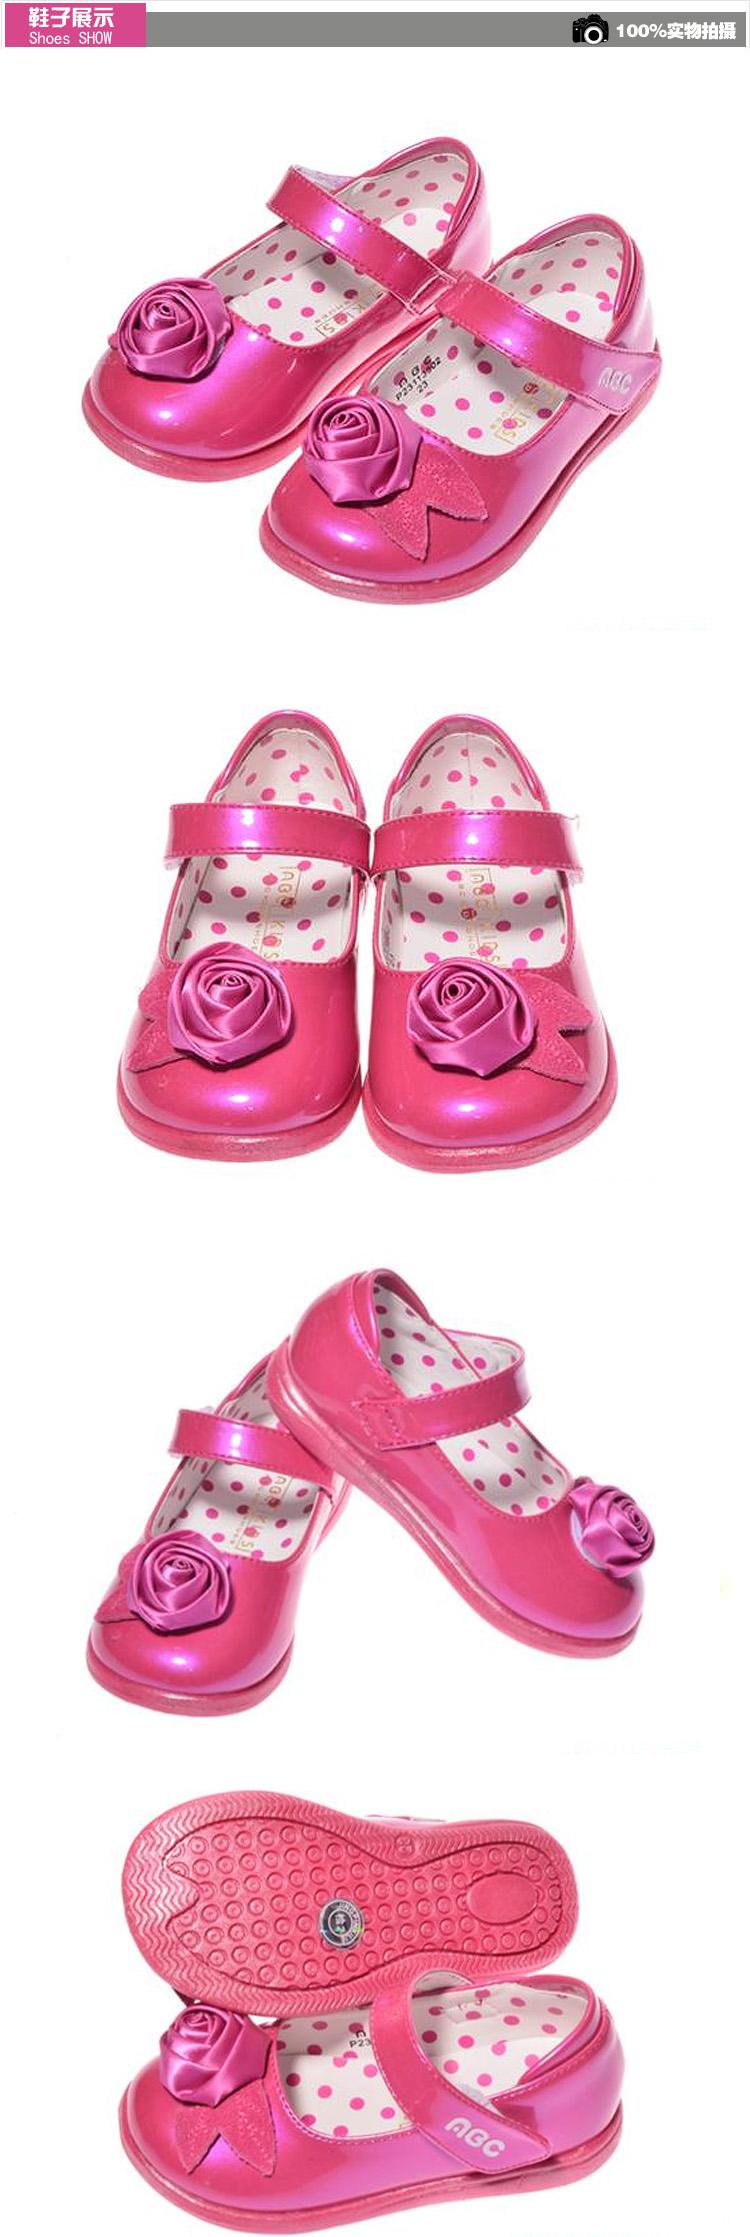 abckids男女童女宝宝玫红皮凉鞋p23113502-6500